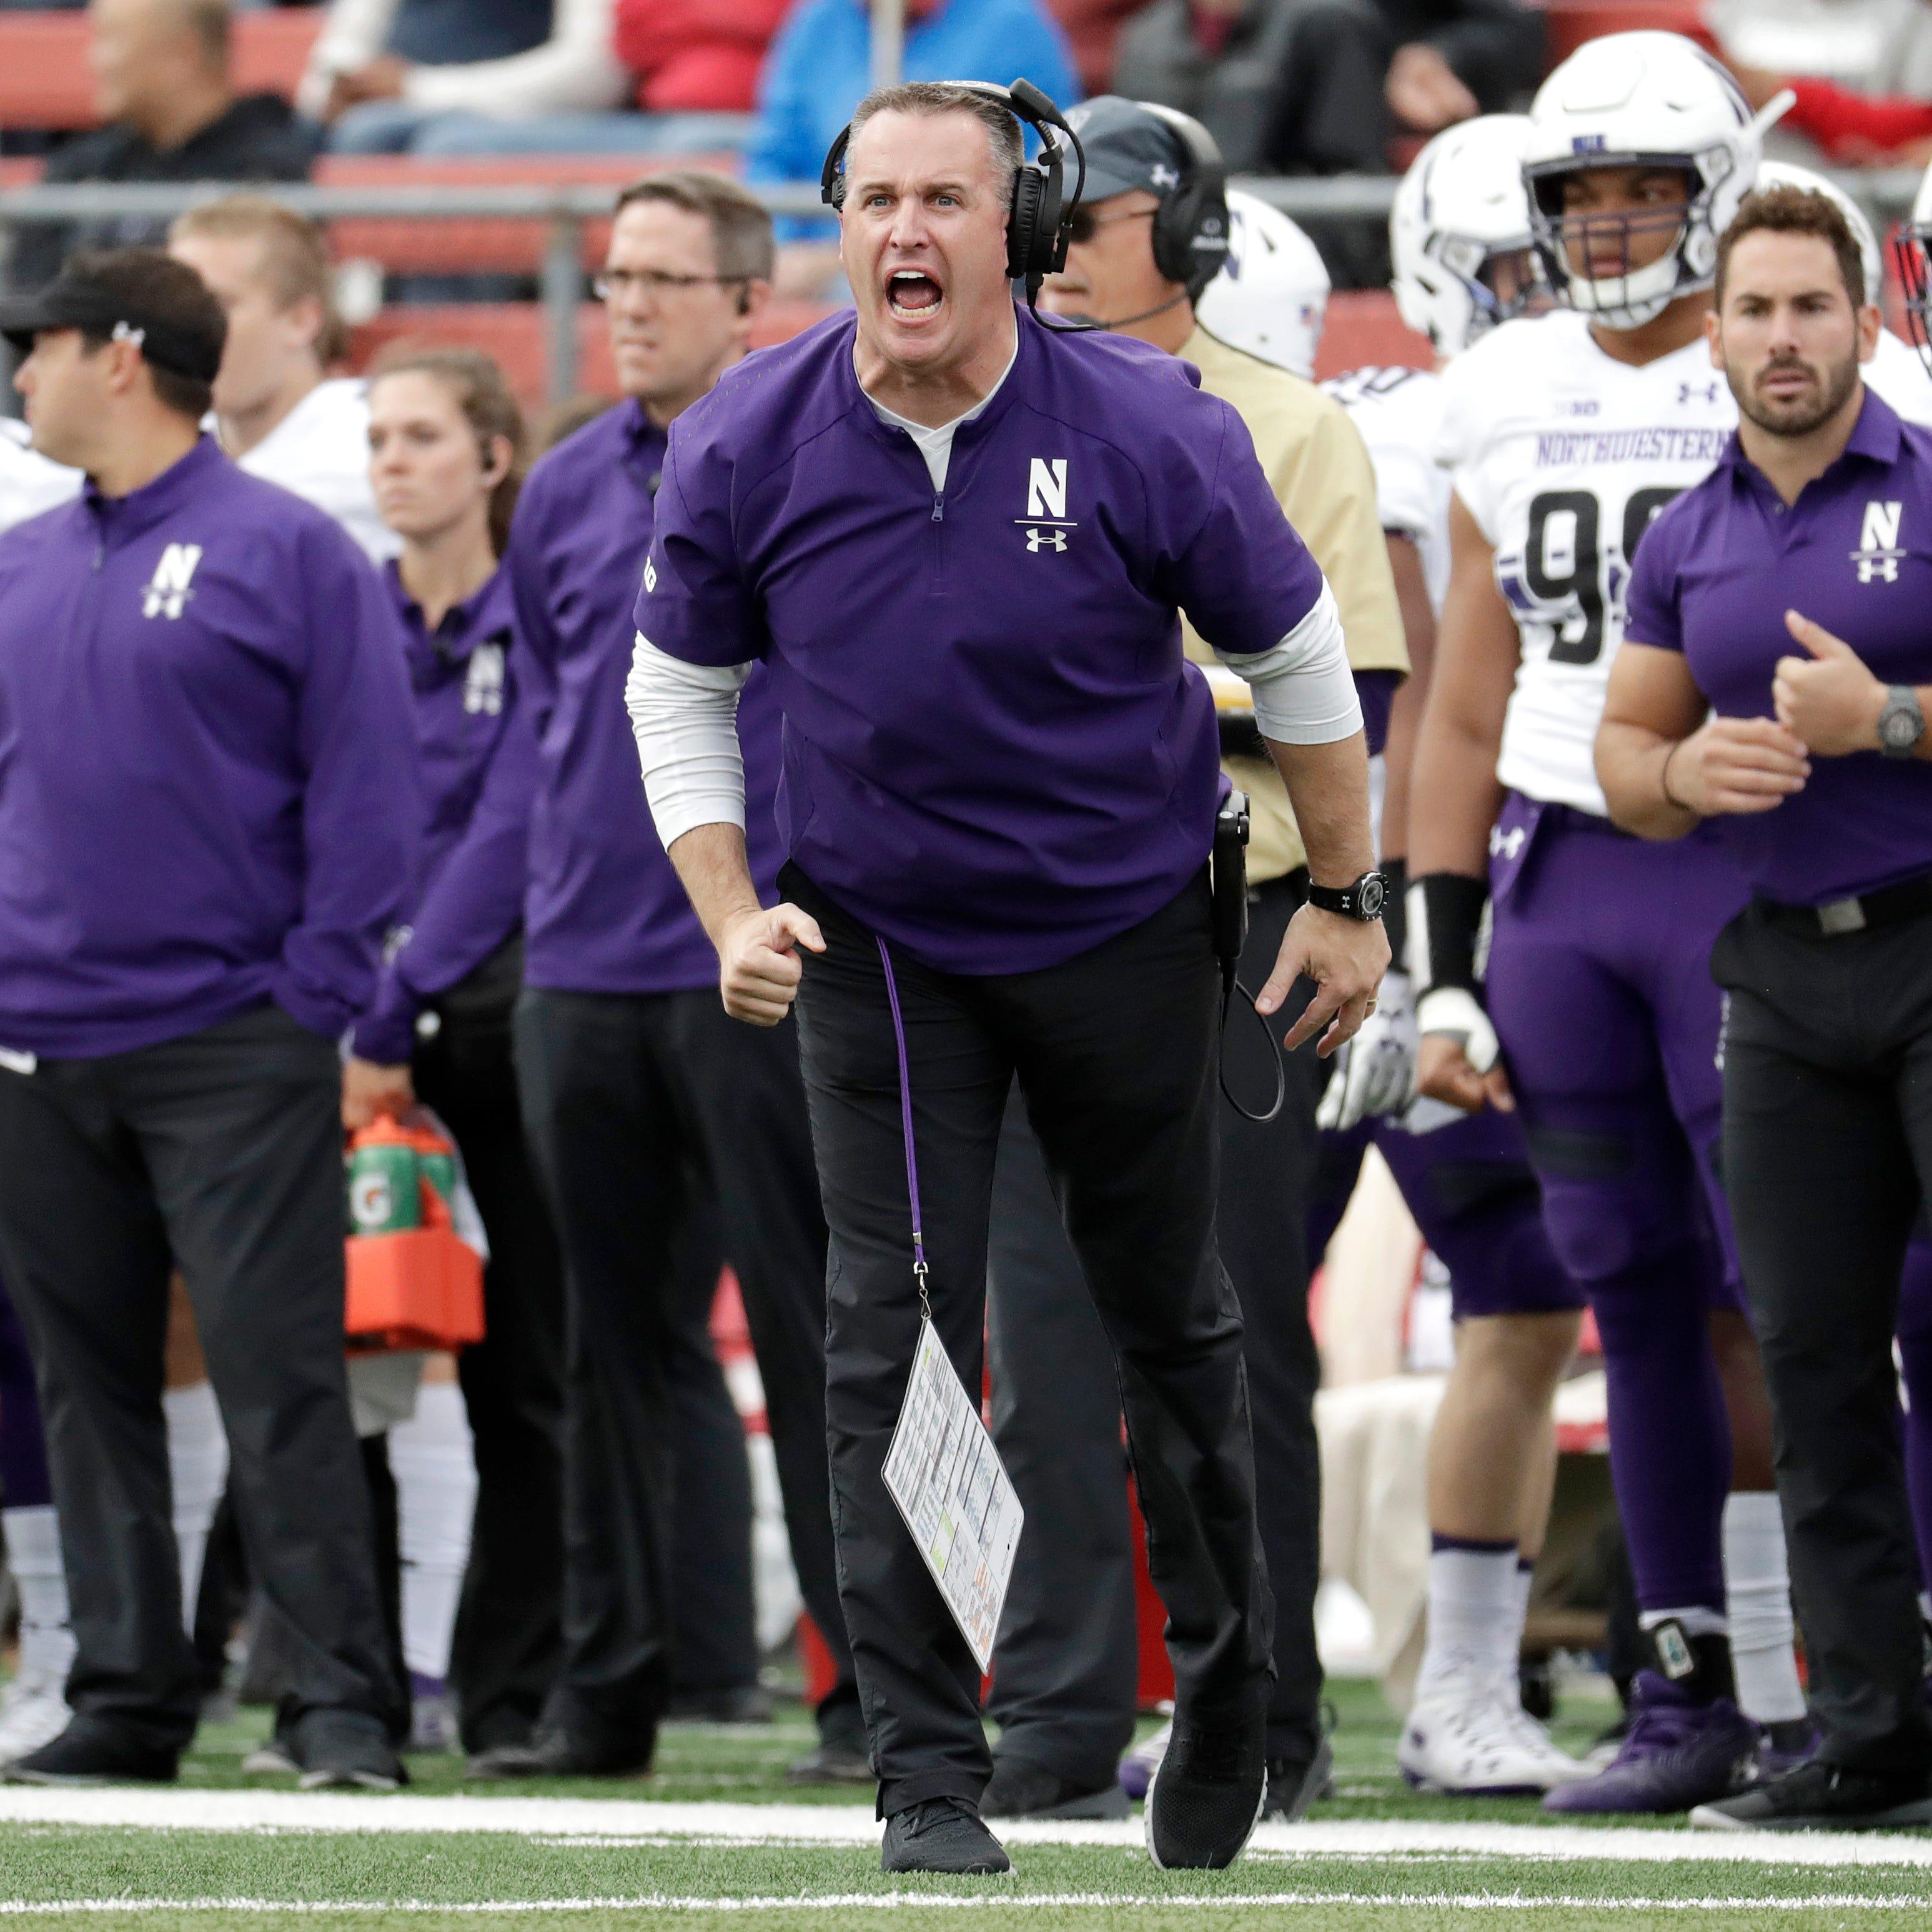 UW's next opponent: Northwestern scouting report